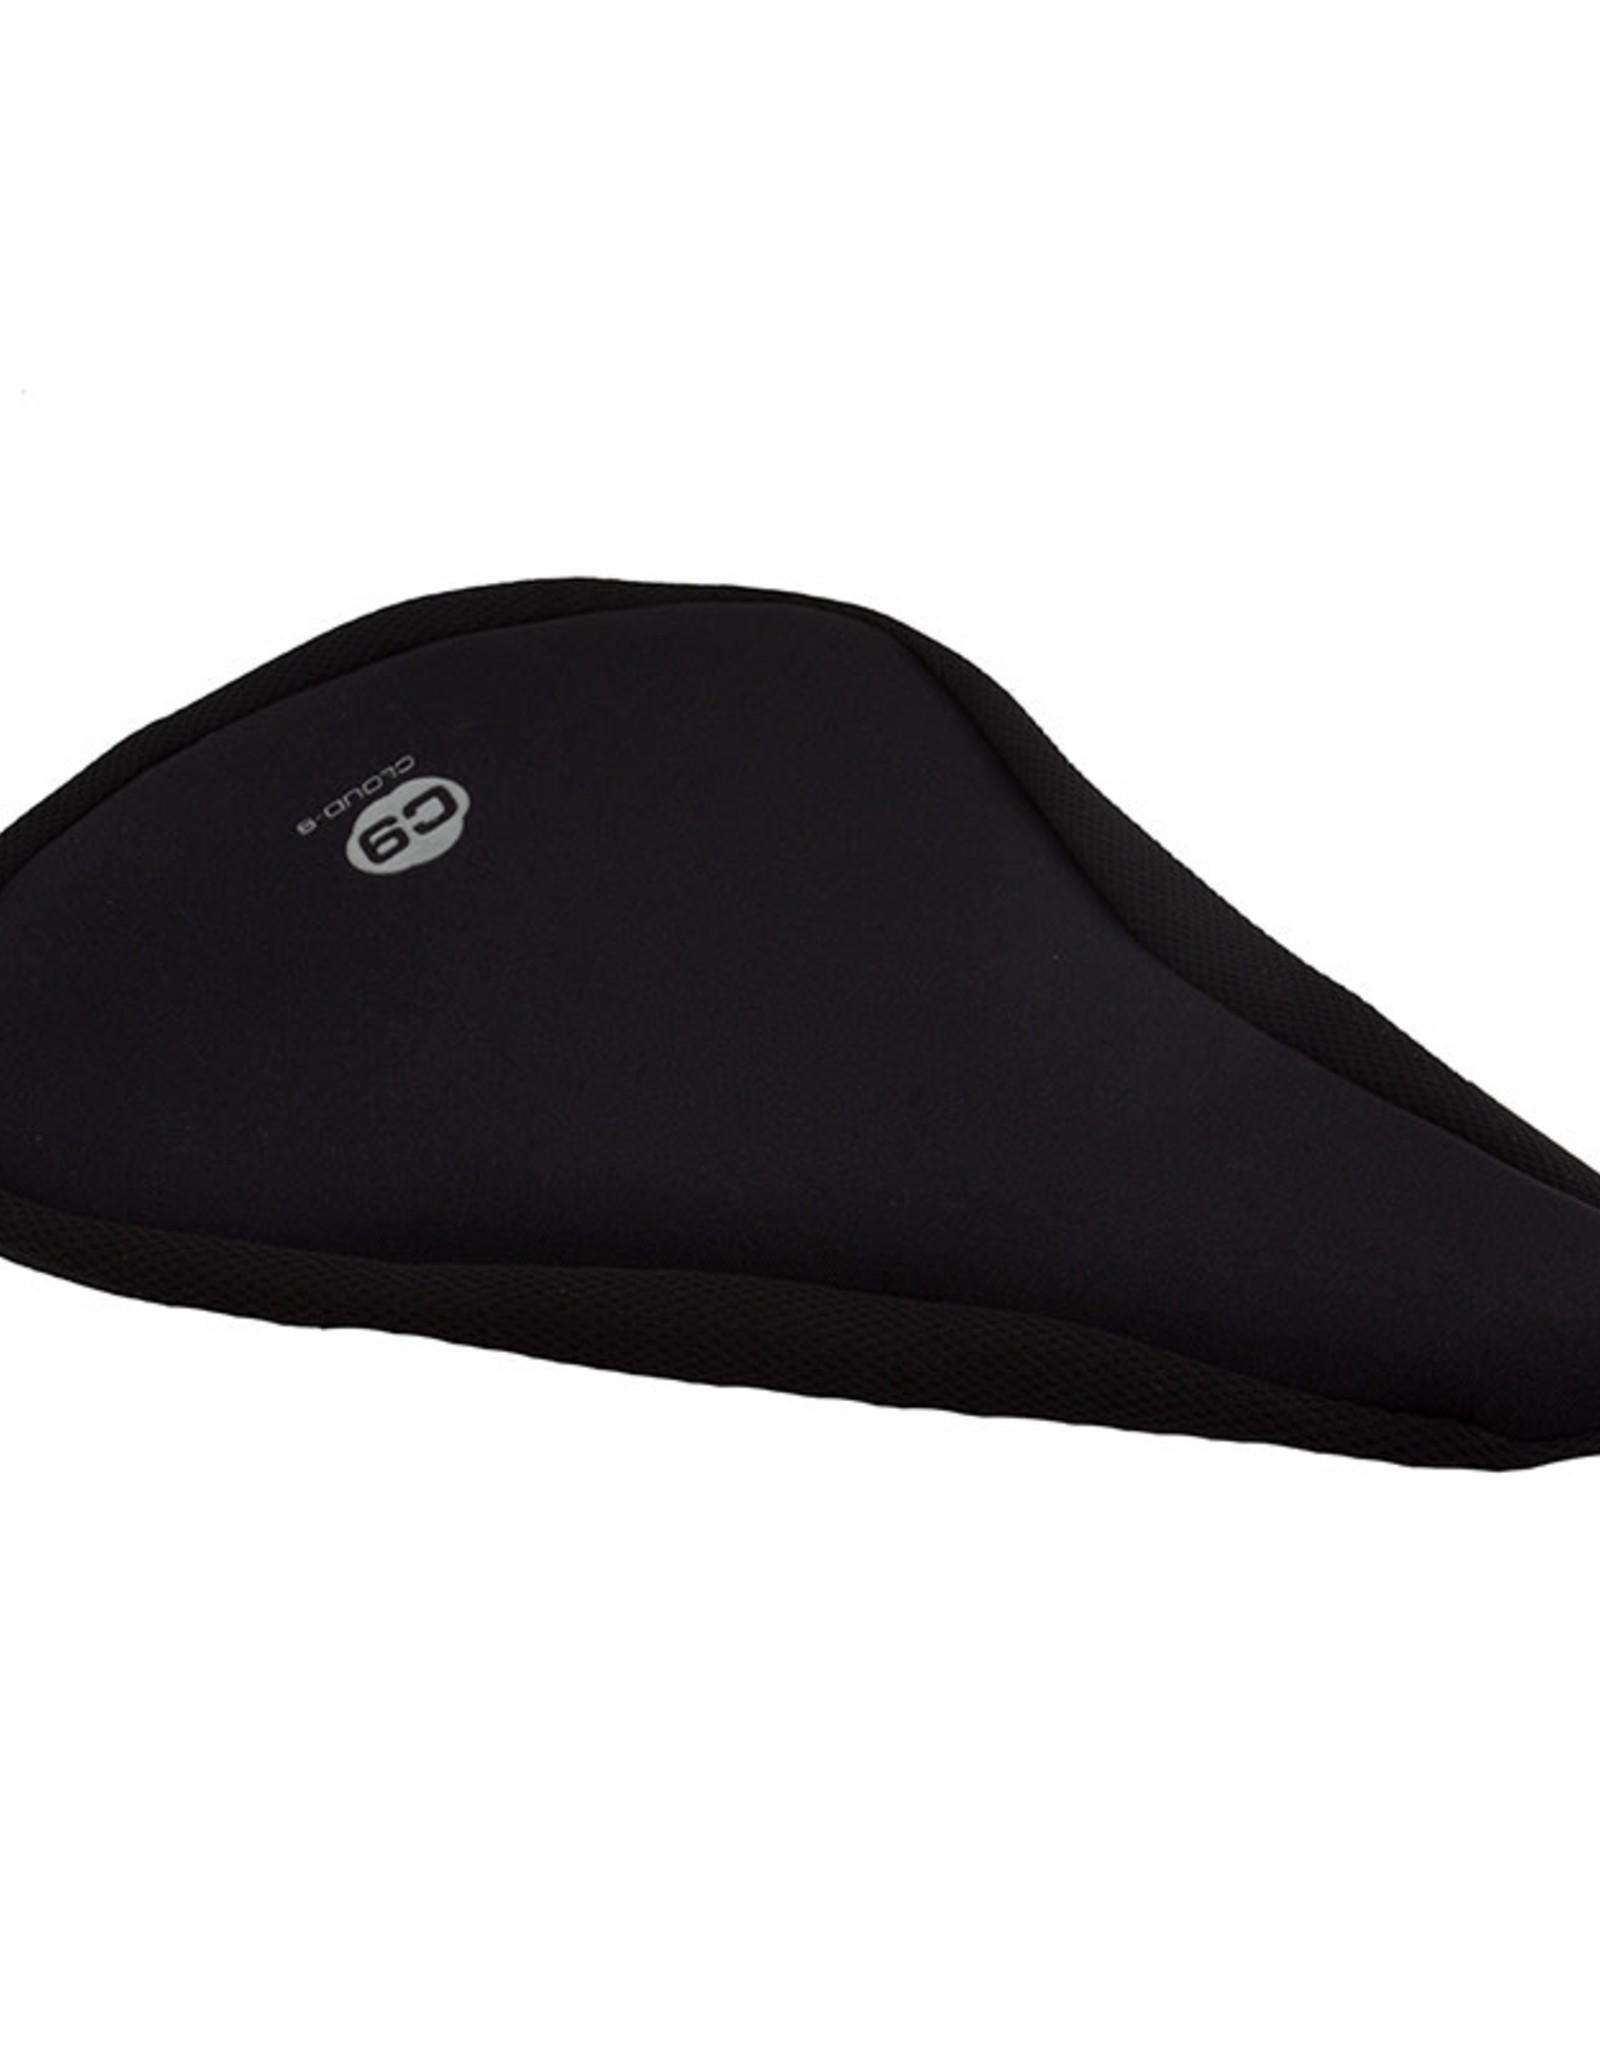 seat cover sunlt gel mtb